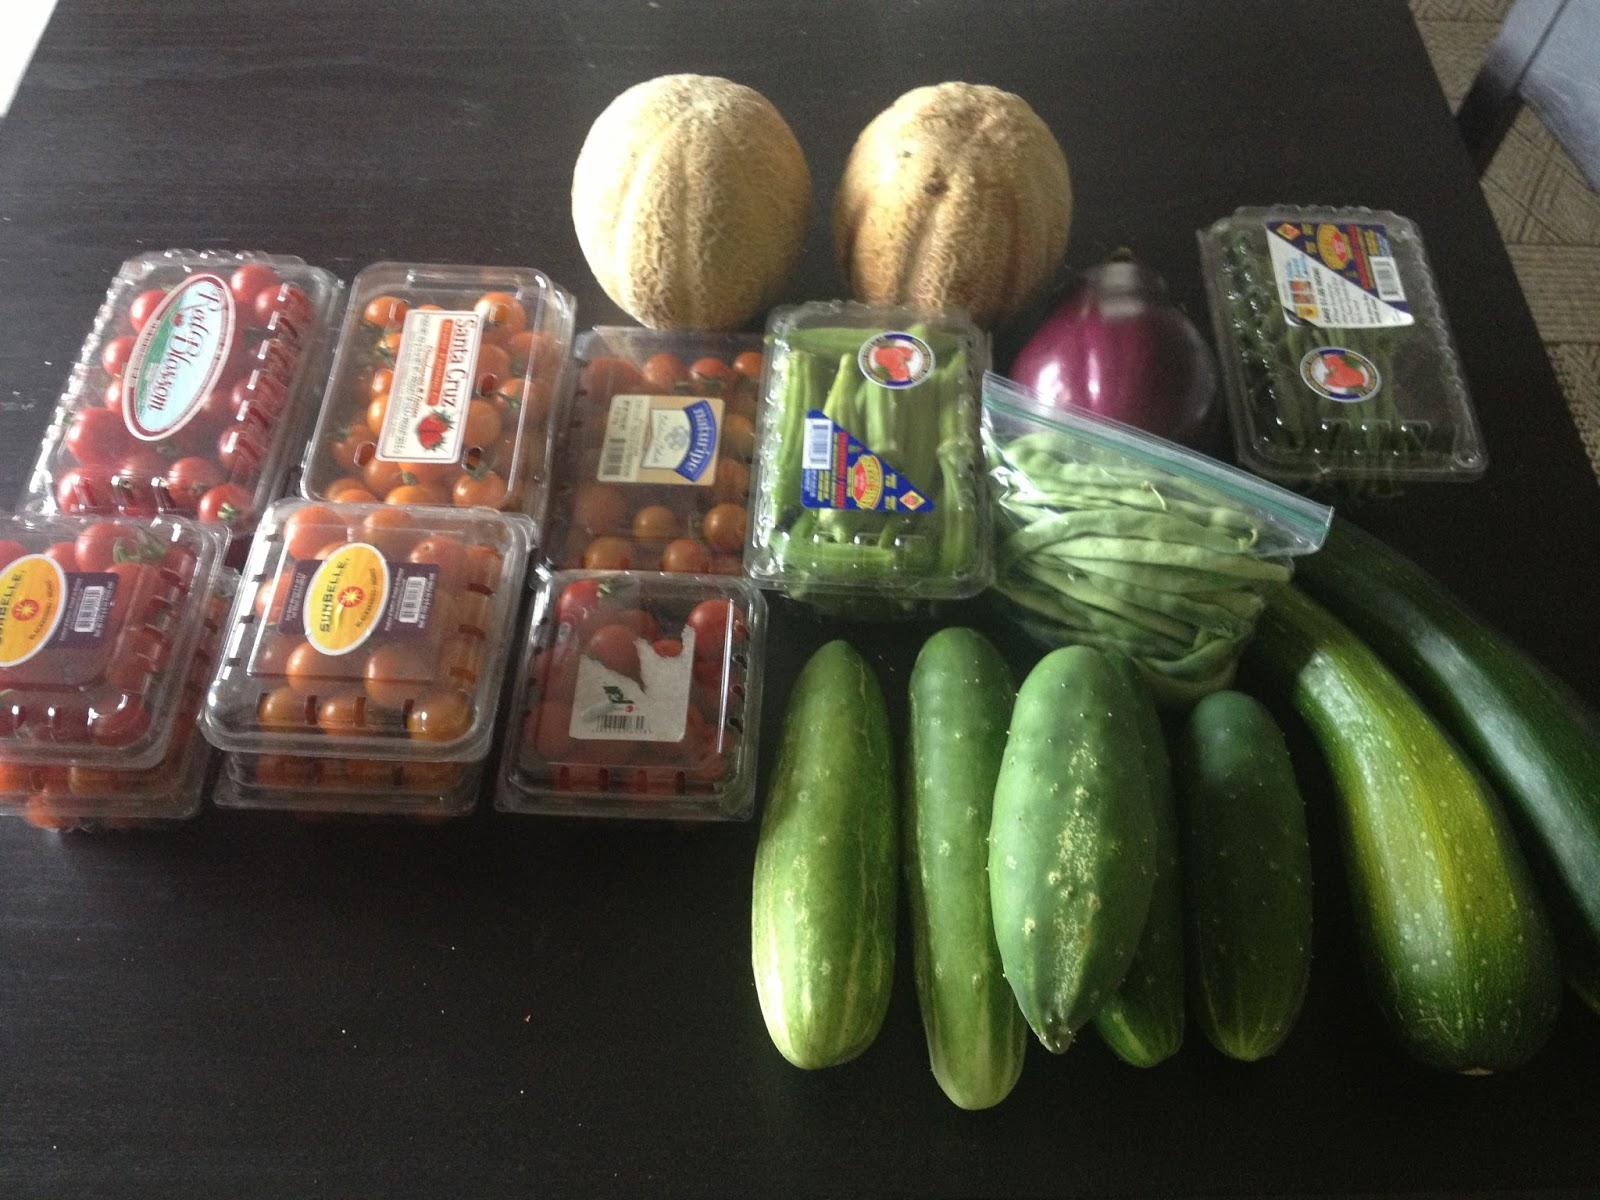 Newburyport Food Pantry